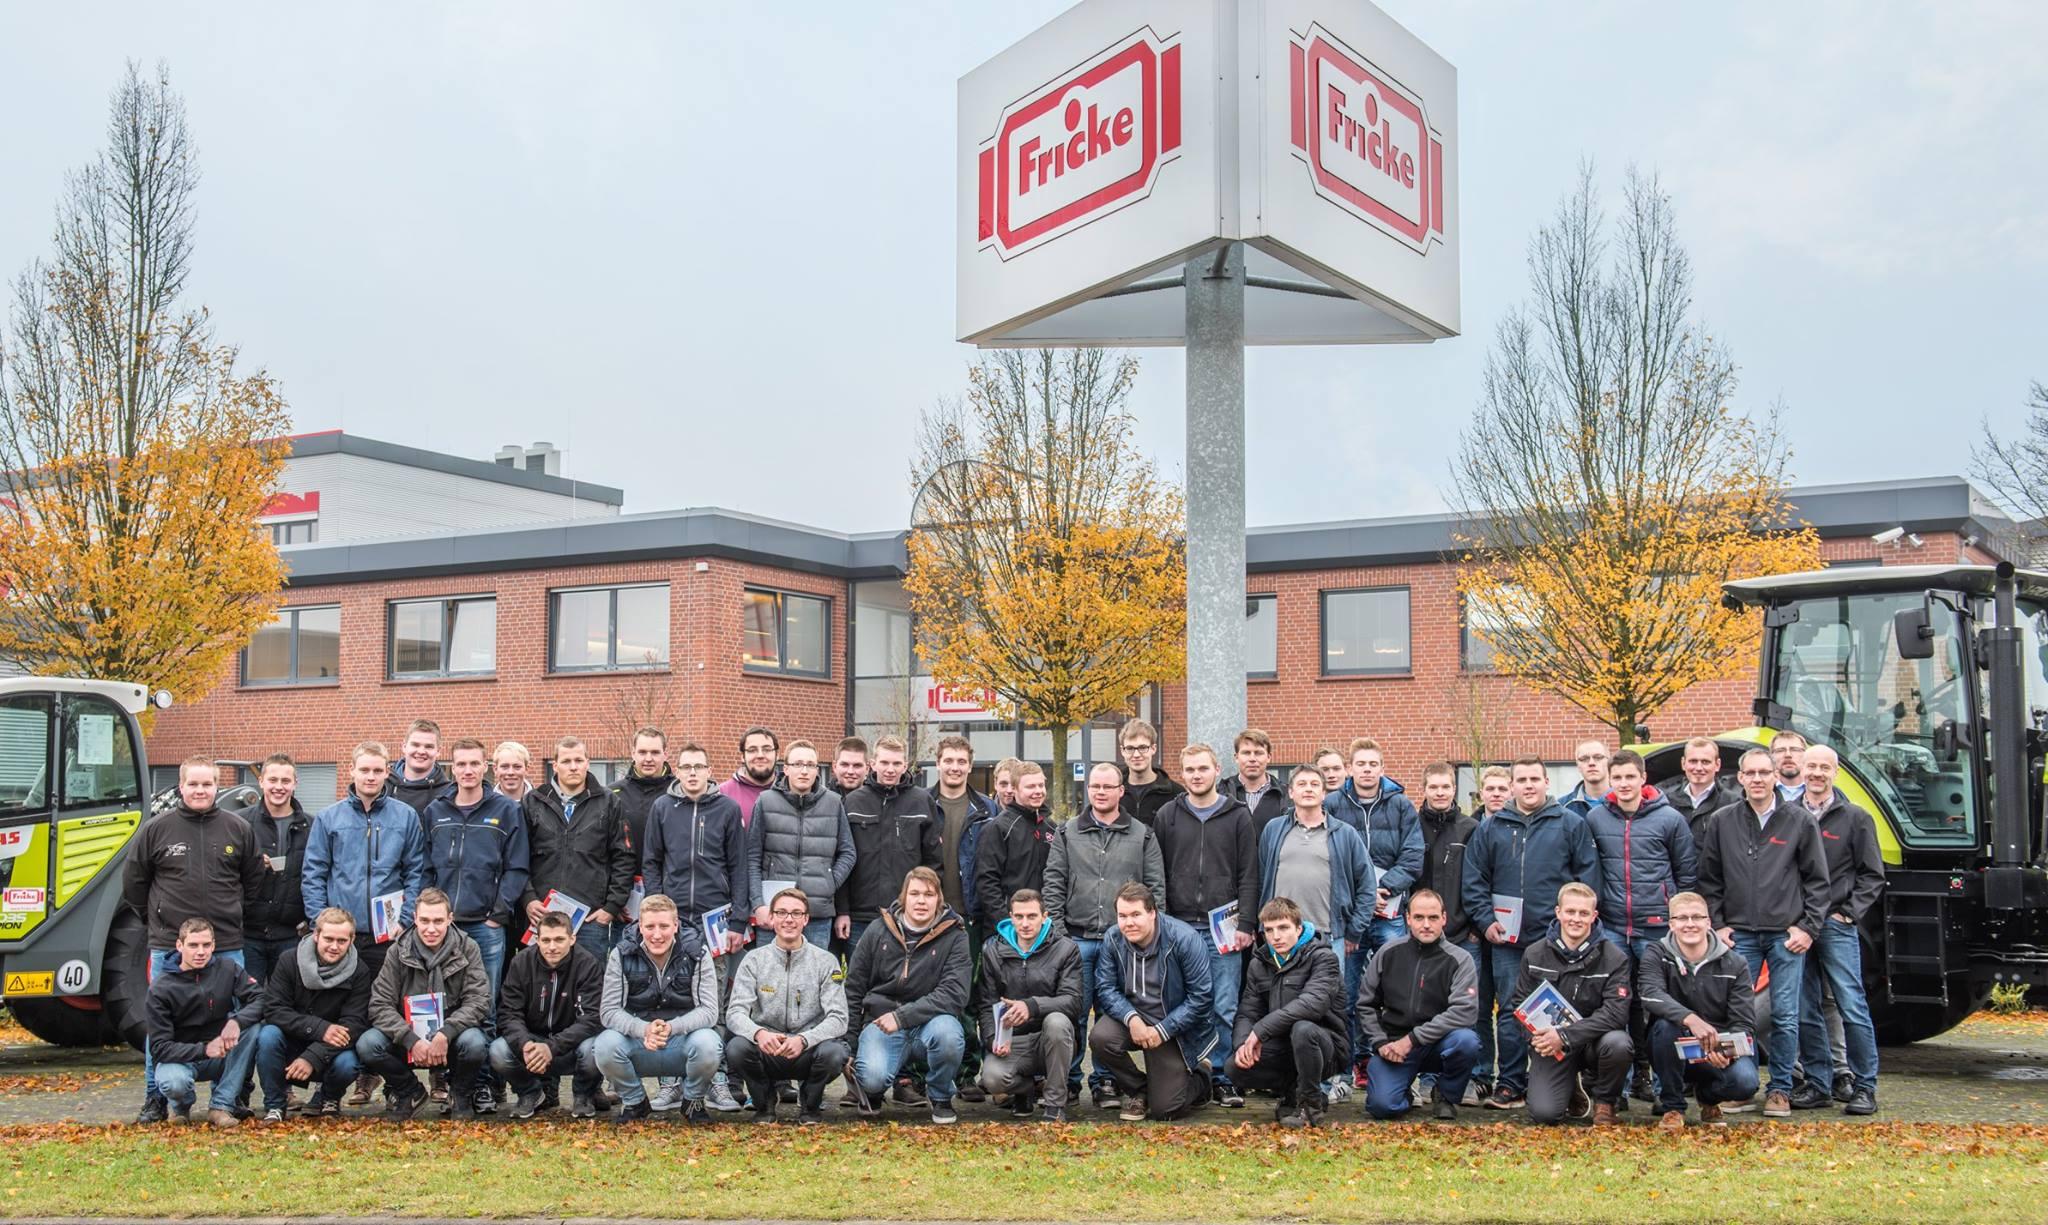 Berufsschüler des Kivinan Bildungszentrum zu Besuch in Heeslingen